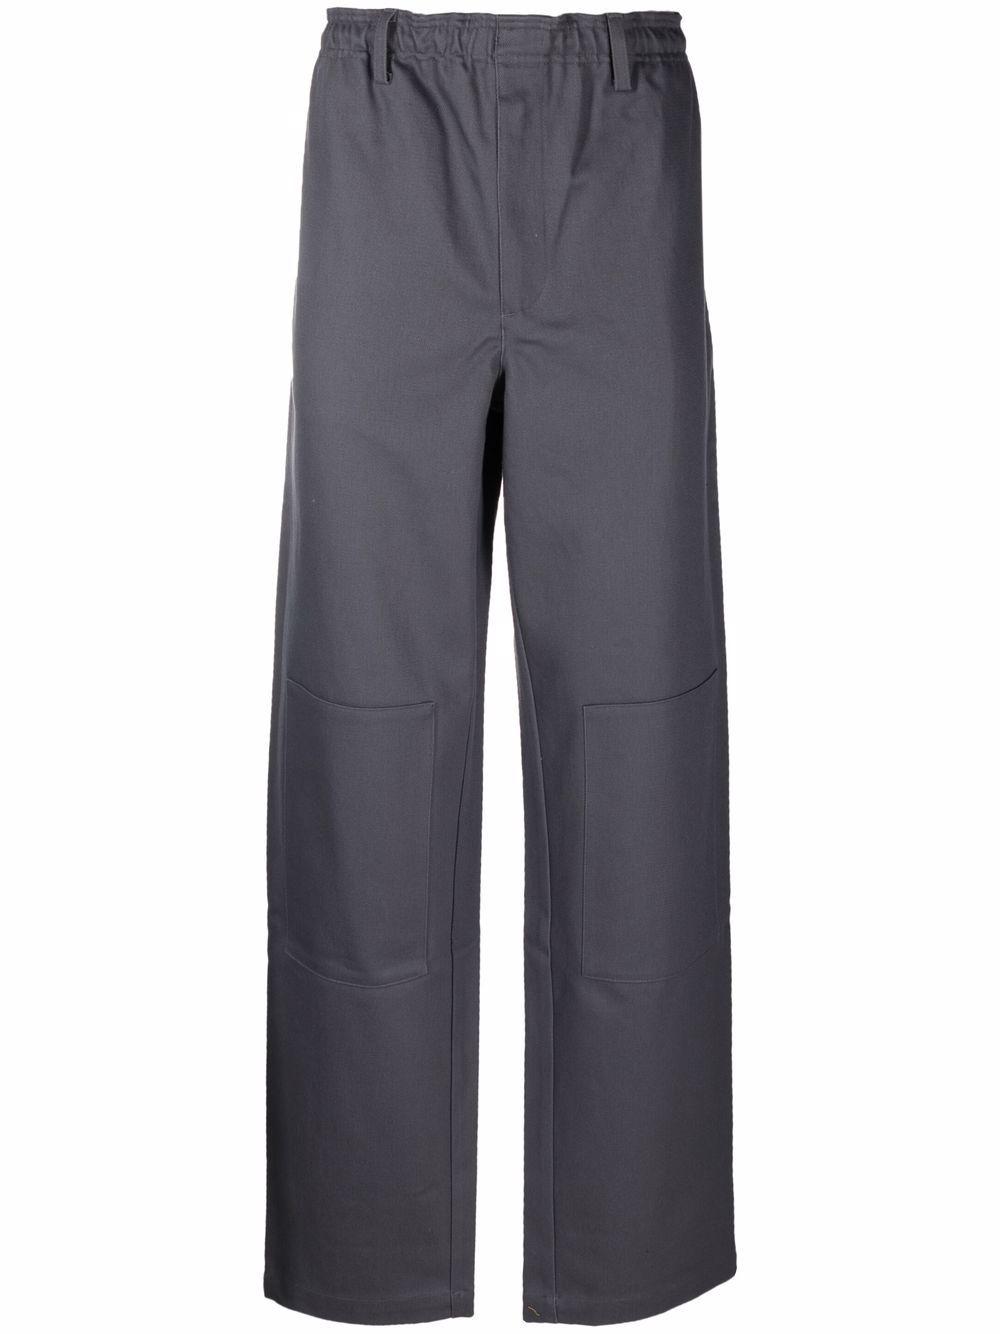 lever trousers man gray in cotton GR10K | Trousers | GR1A9KECONVOY GREY